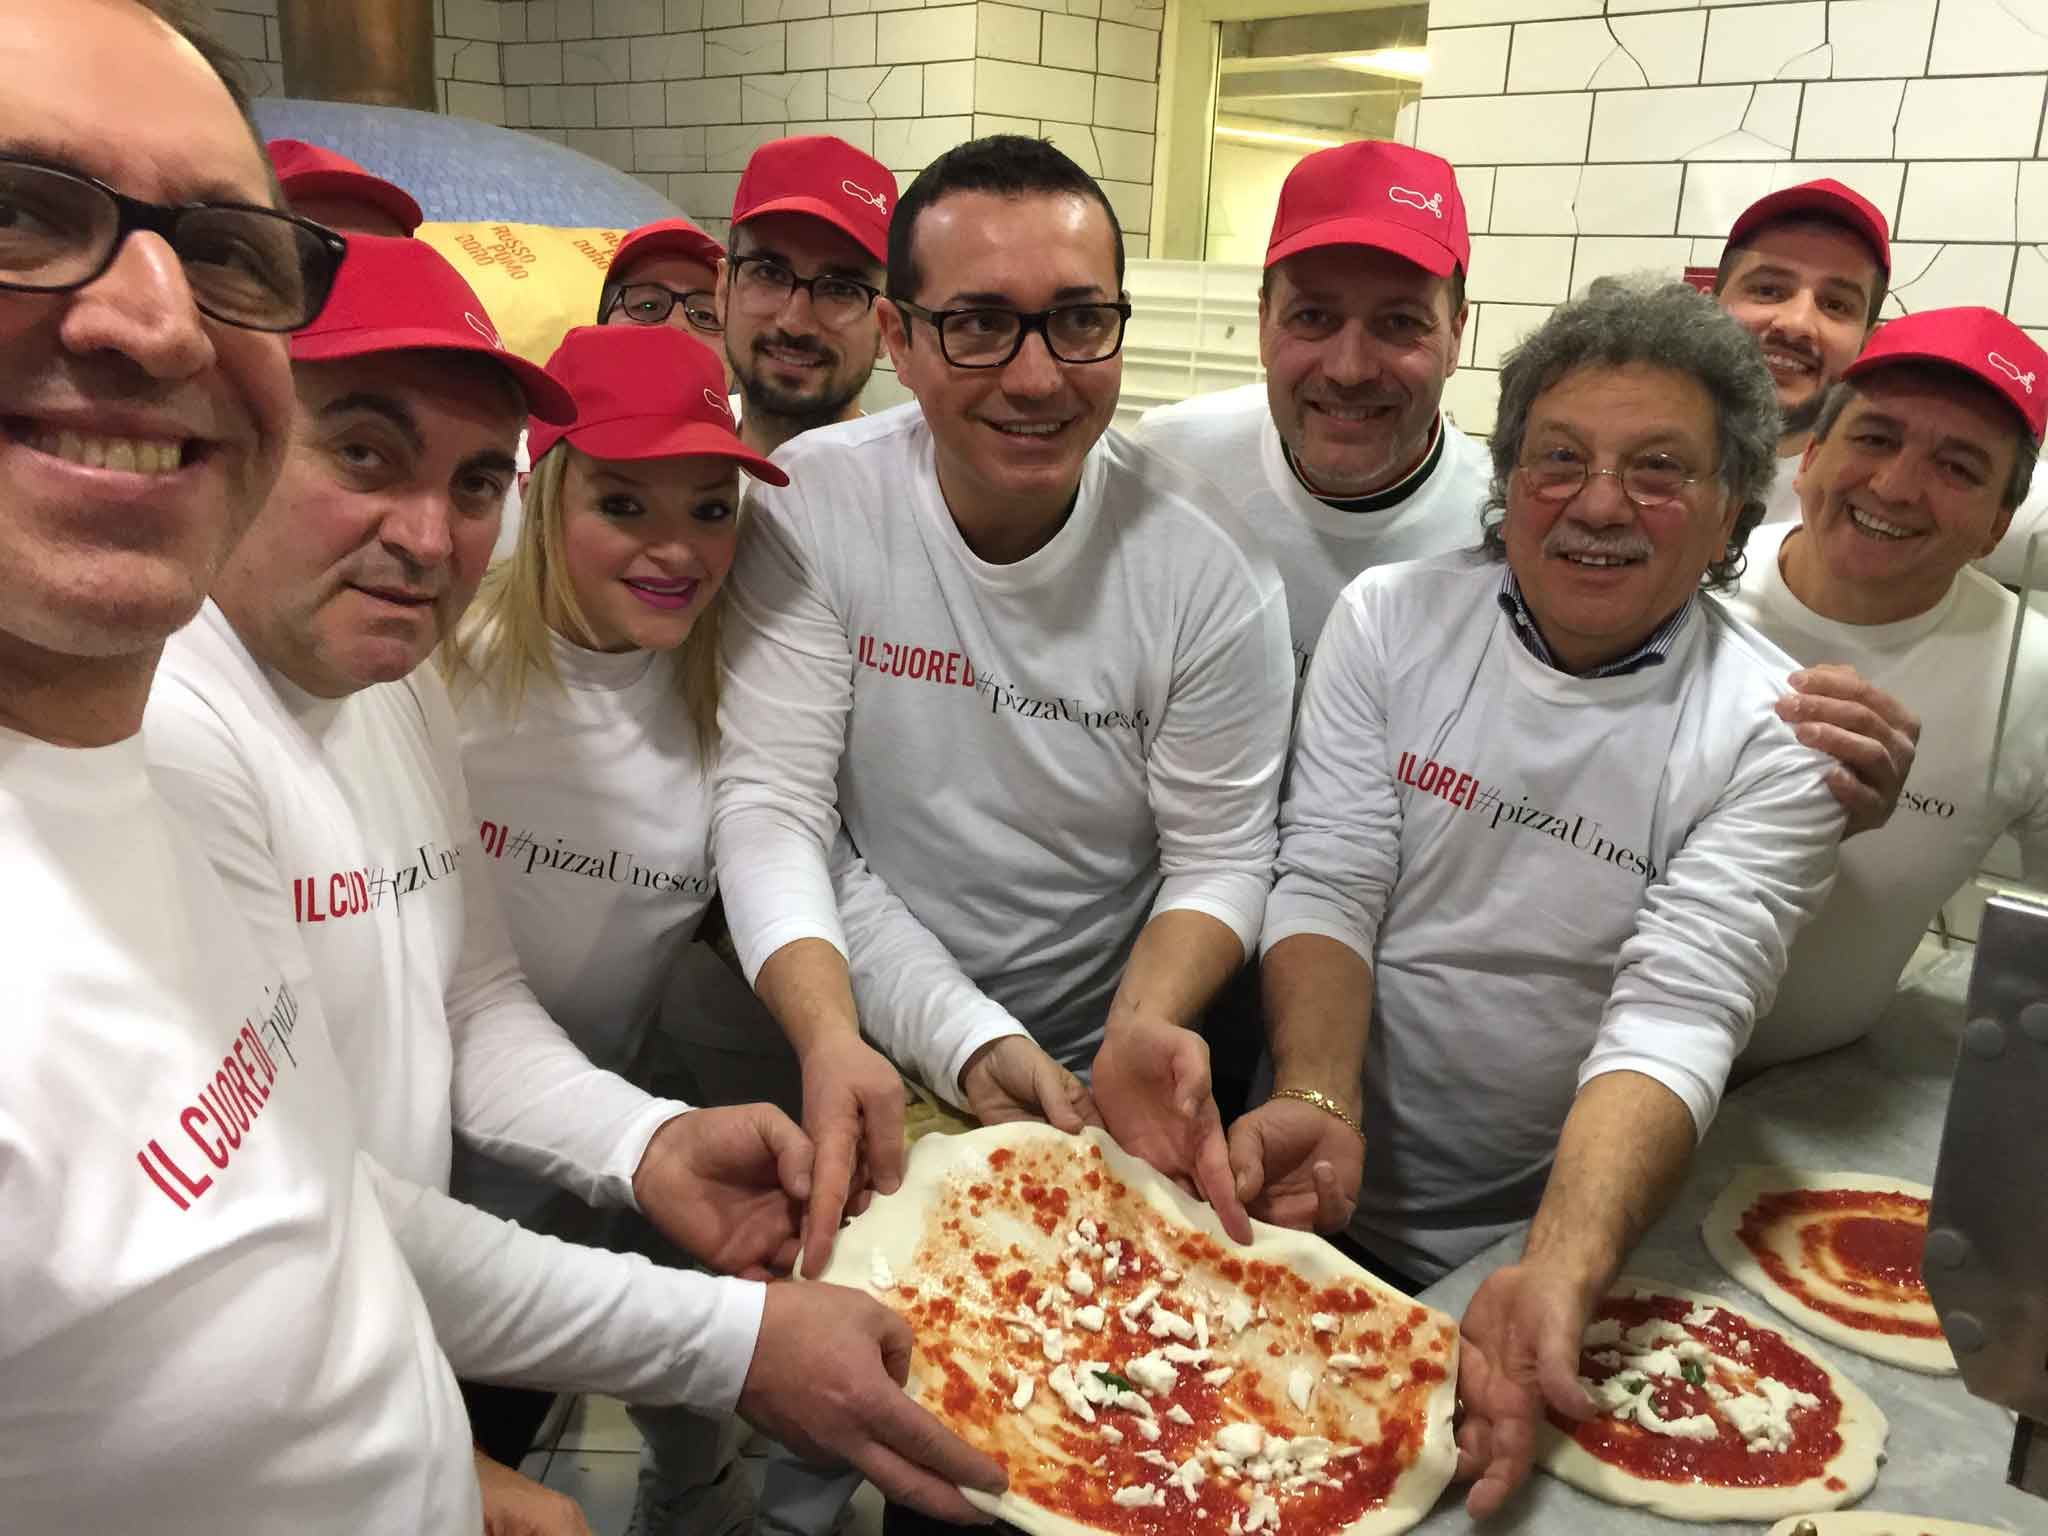 cuore #pizzaunesco 9